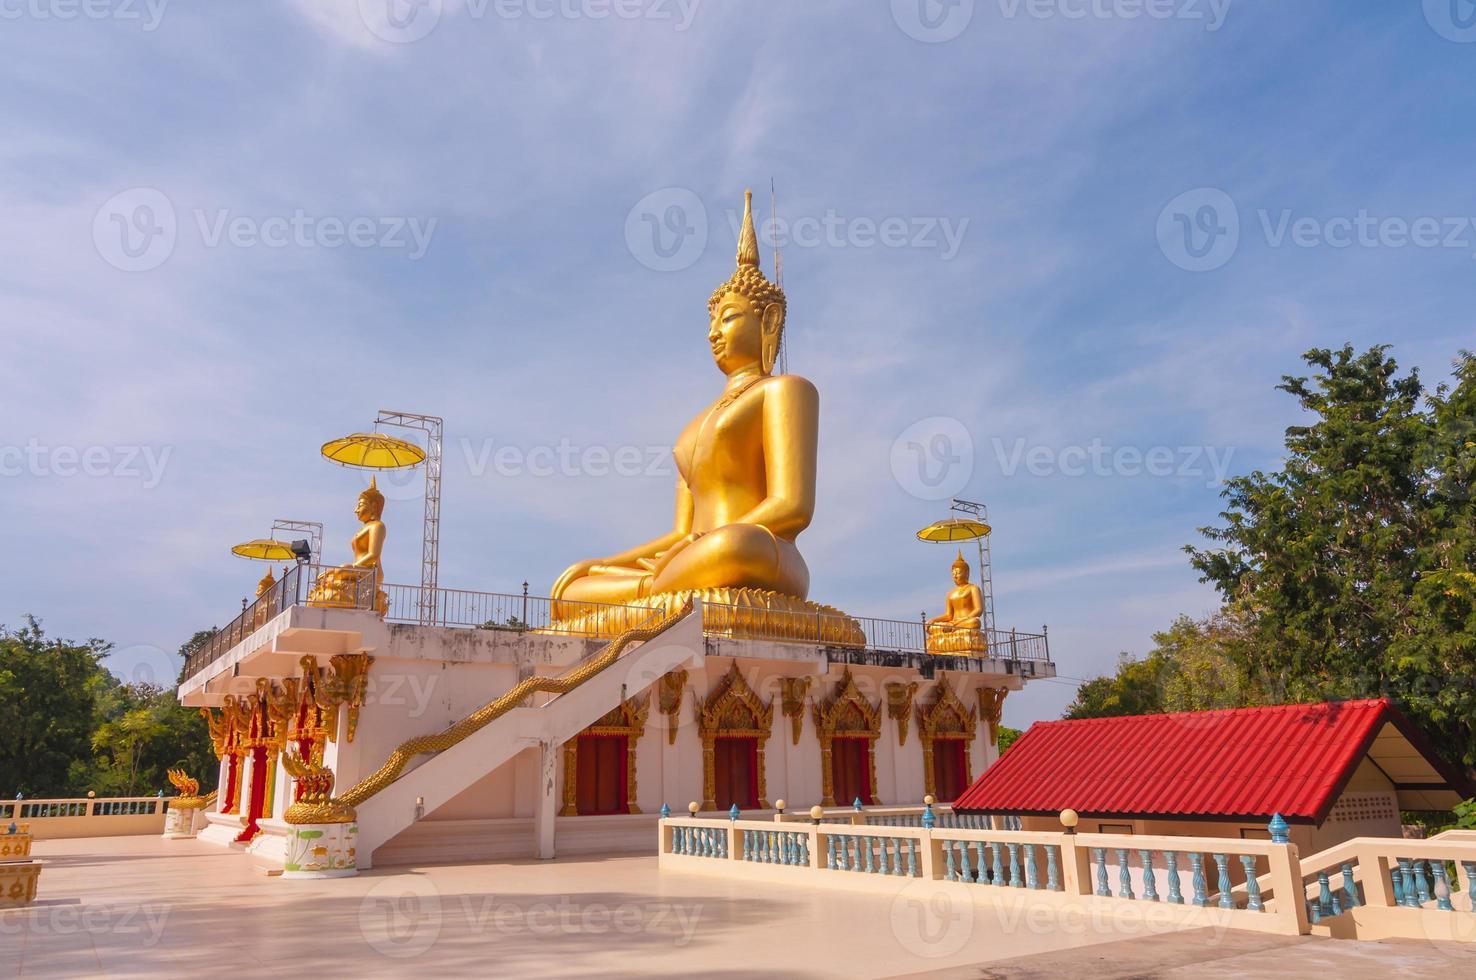 grande belo Buda de ouro em wat phathep nimit foto